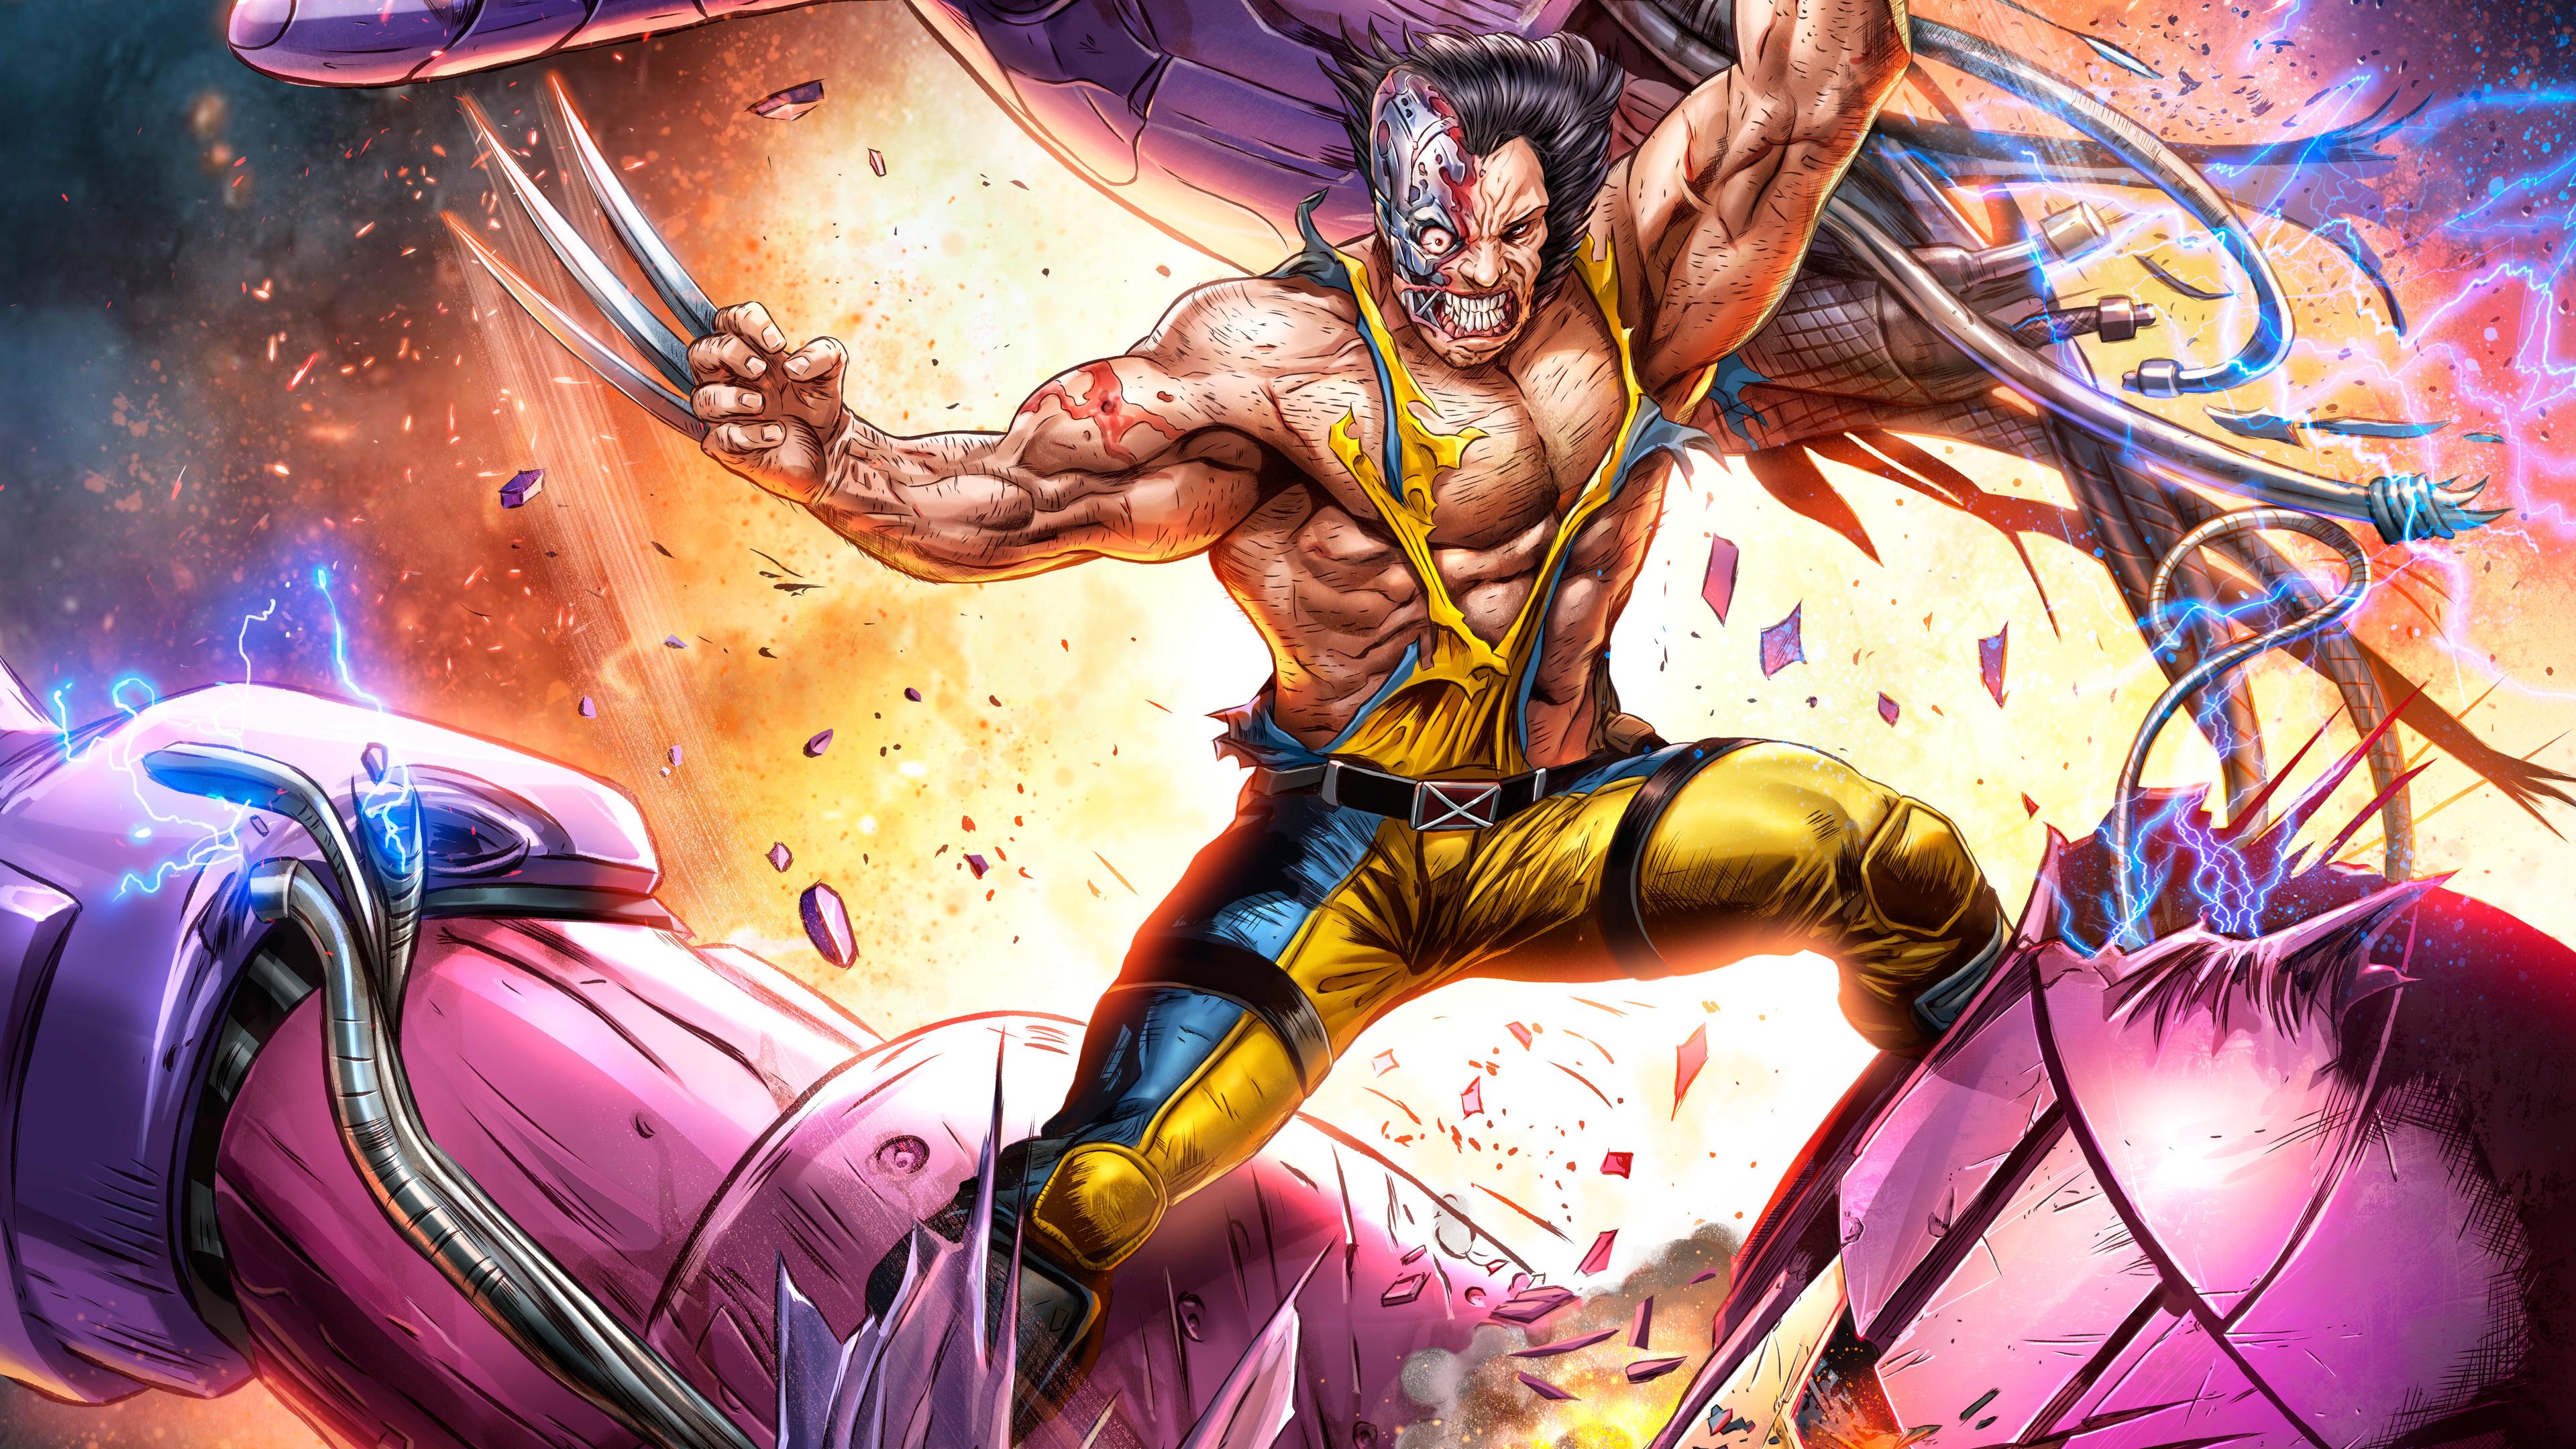 wolverine vs sentinel artwork 5k 1537645987 - Wolverine Vs Sentinel Artwork 5k - wolverine wallpapers, superheroes wallpapers, sentinel wallpapers, marvel wallpapers, hd-wallpapers, digital art wallpapers, artwork wallpapers, 5k wallpapers, 4k-wallpapers